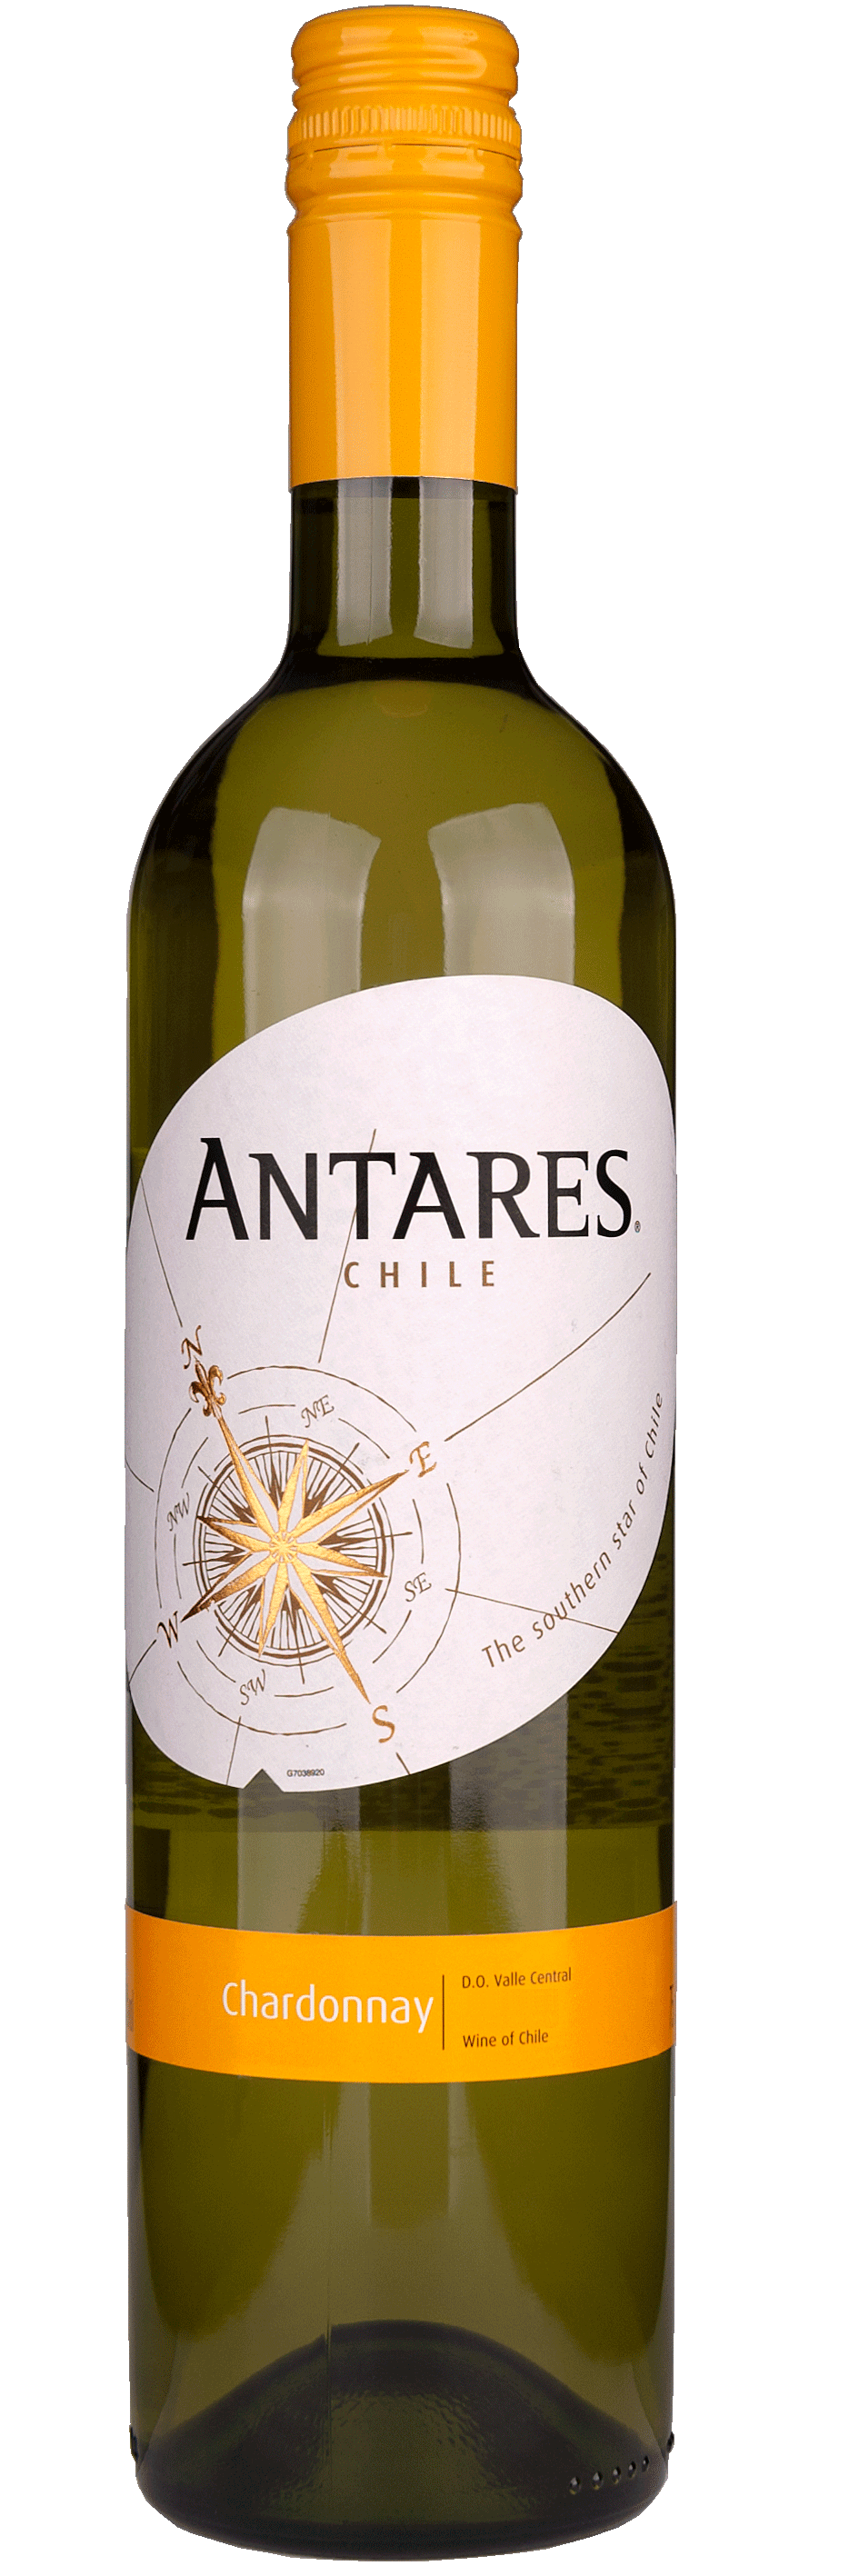 Santa Carolina Antares Chardonnay Central Valley 75cl